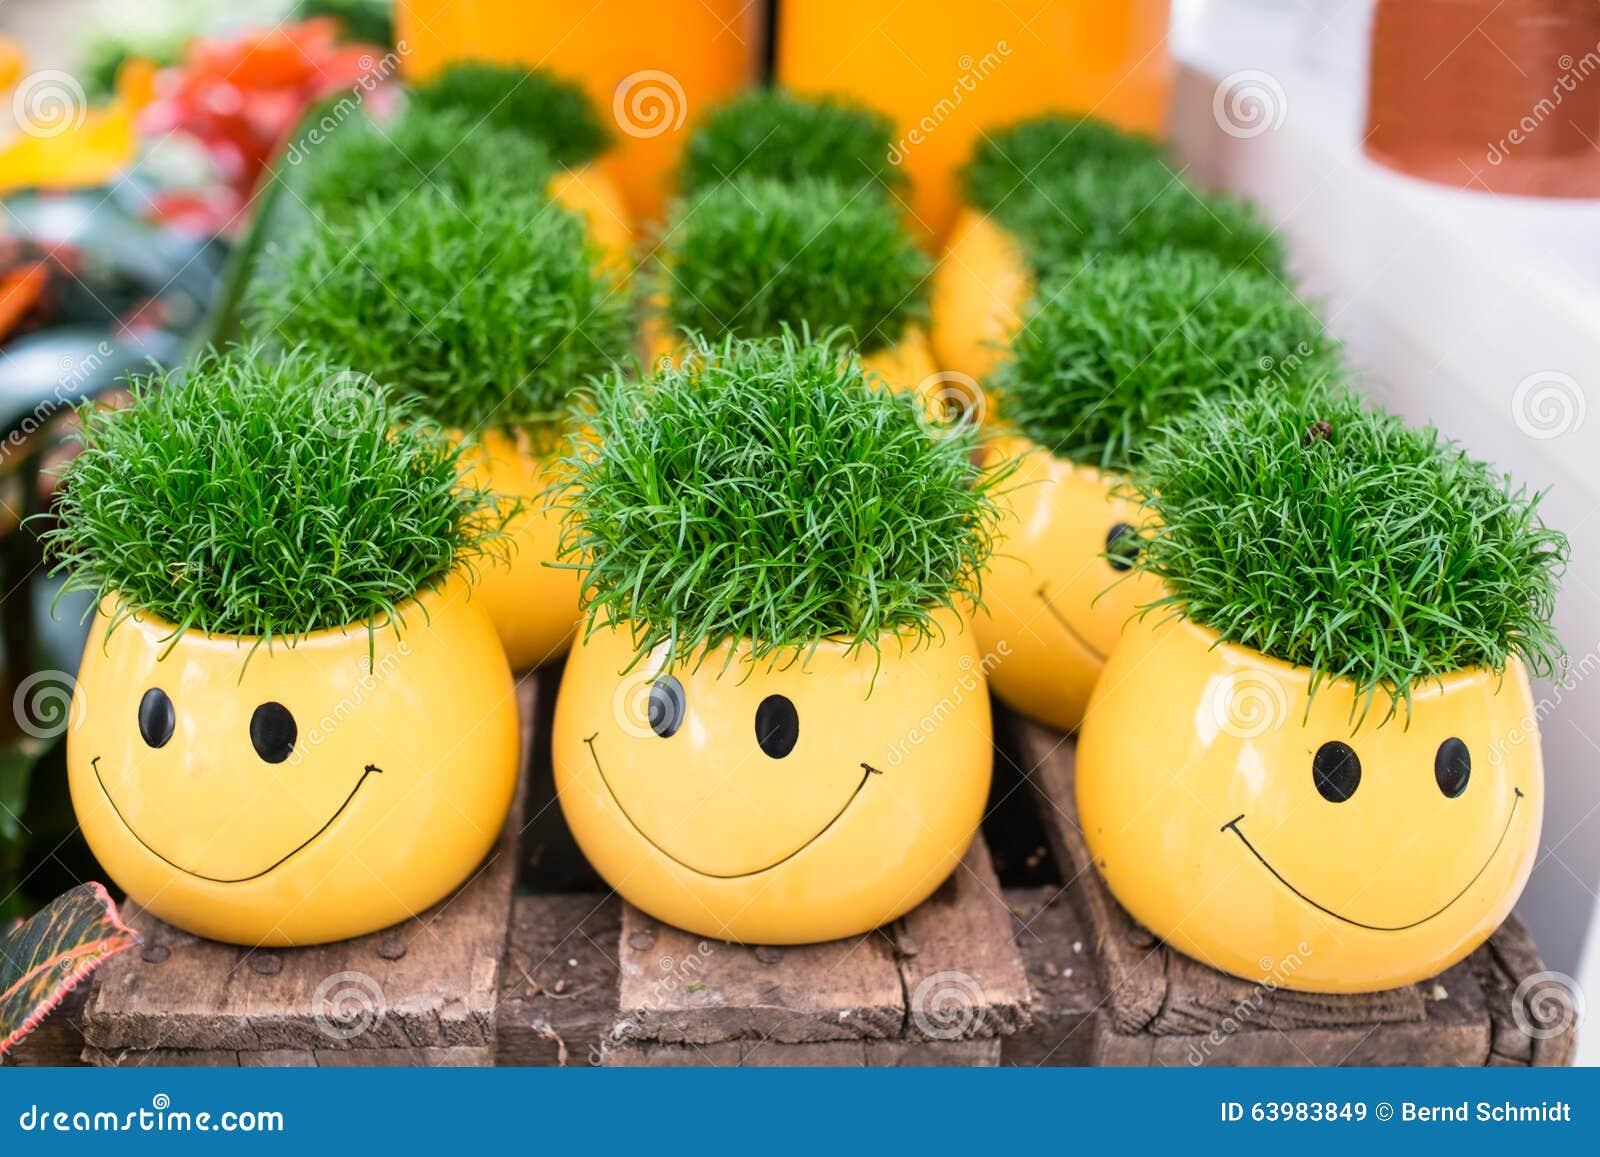 Vasi da fiori gialli con smilie ed erba verde fotografia for Vasi erba